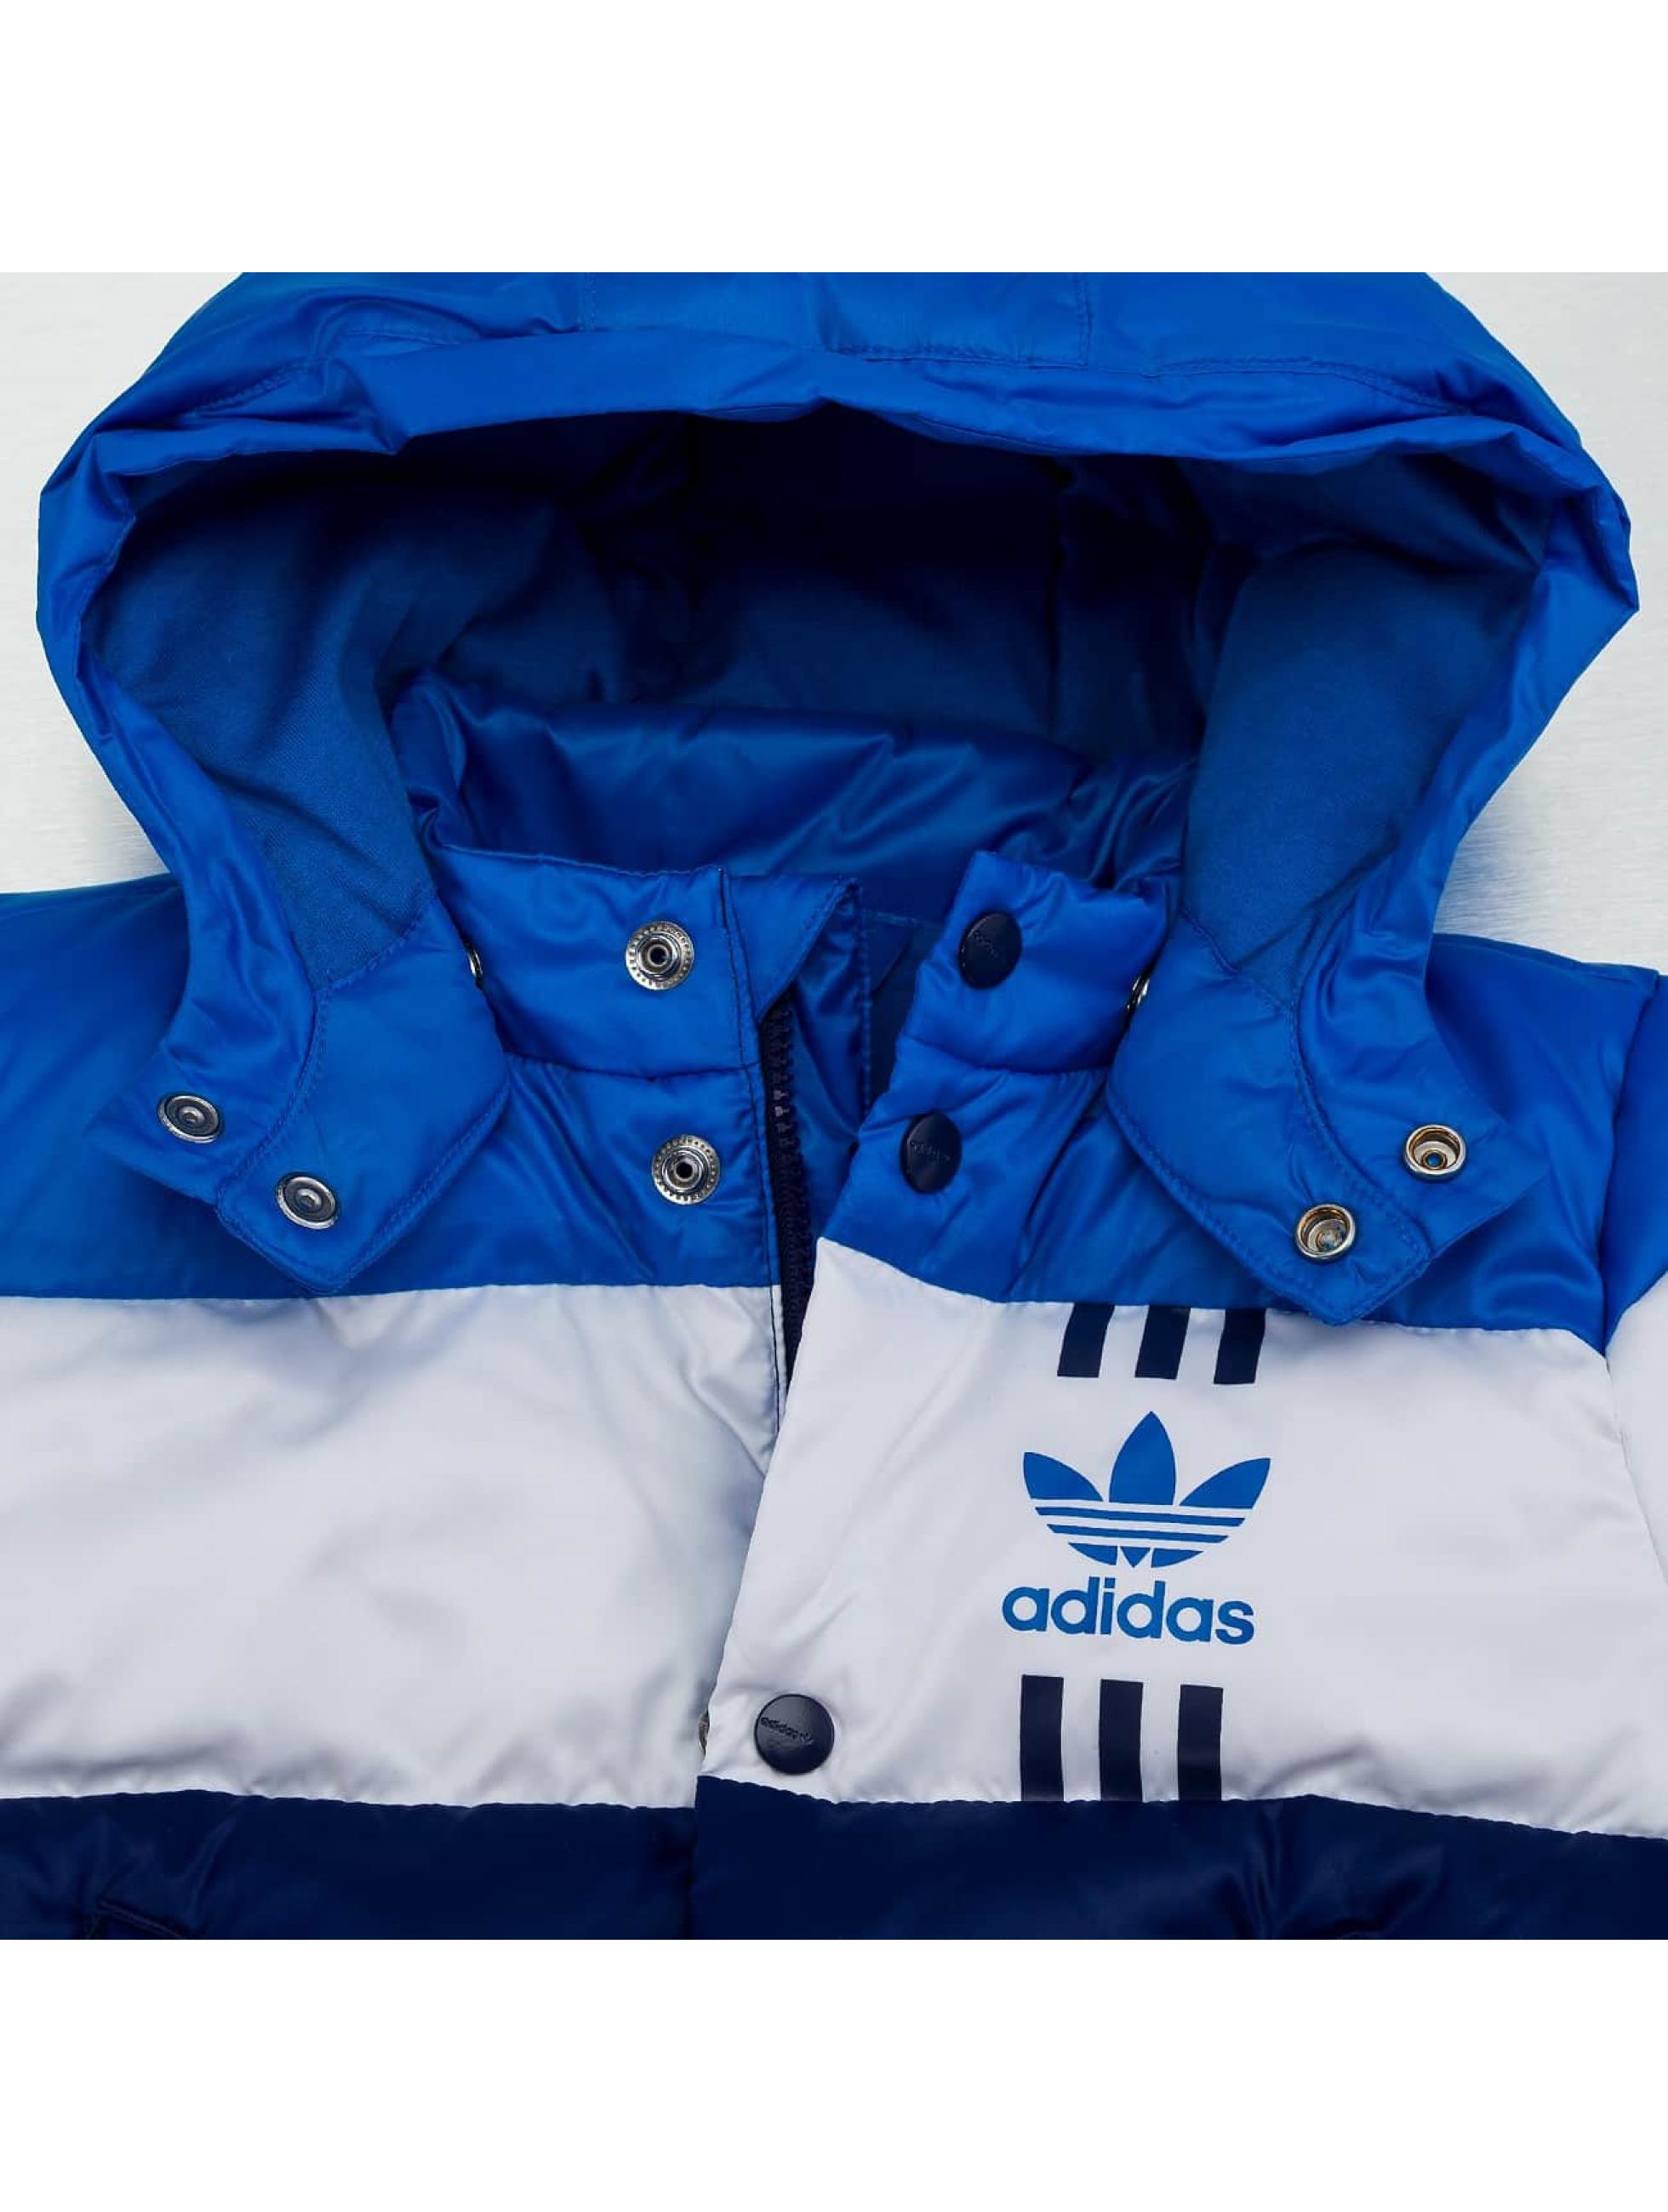 adidas Winter Jacket ID-96 blue